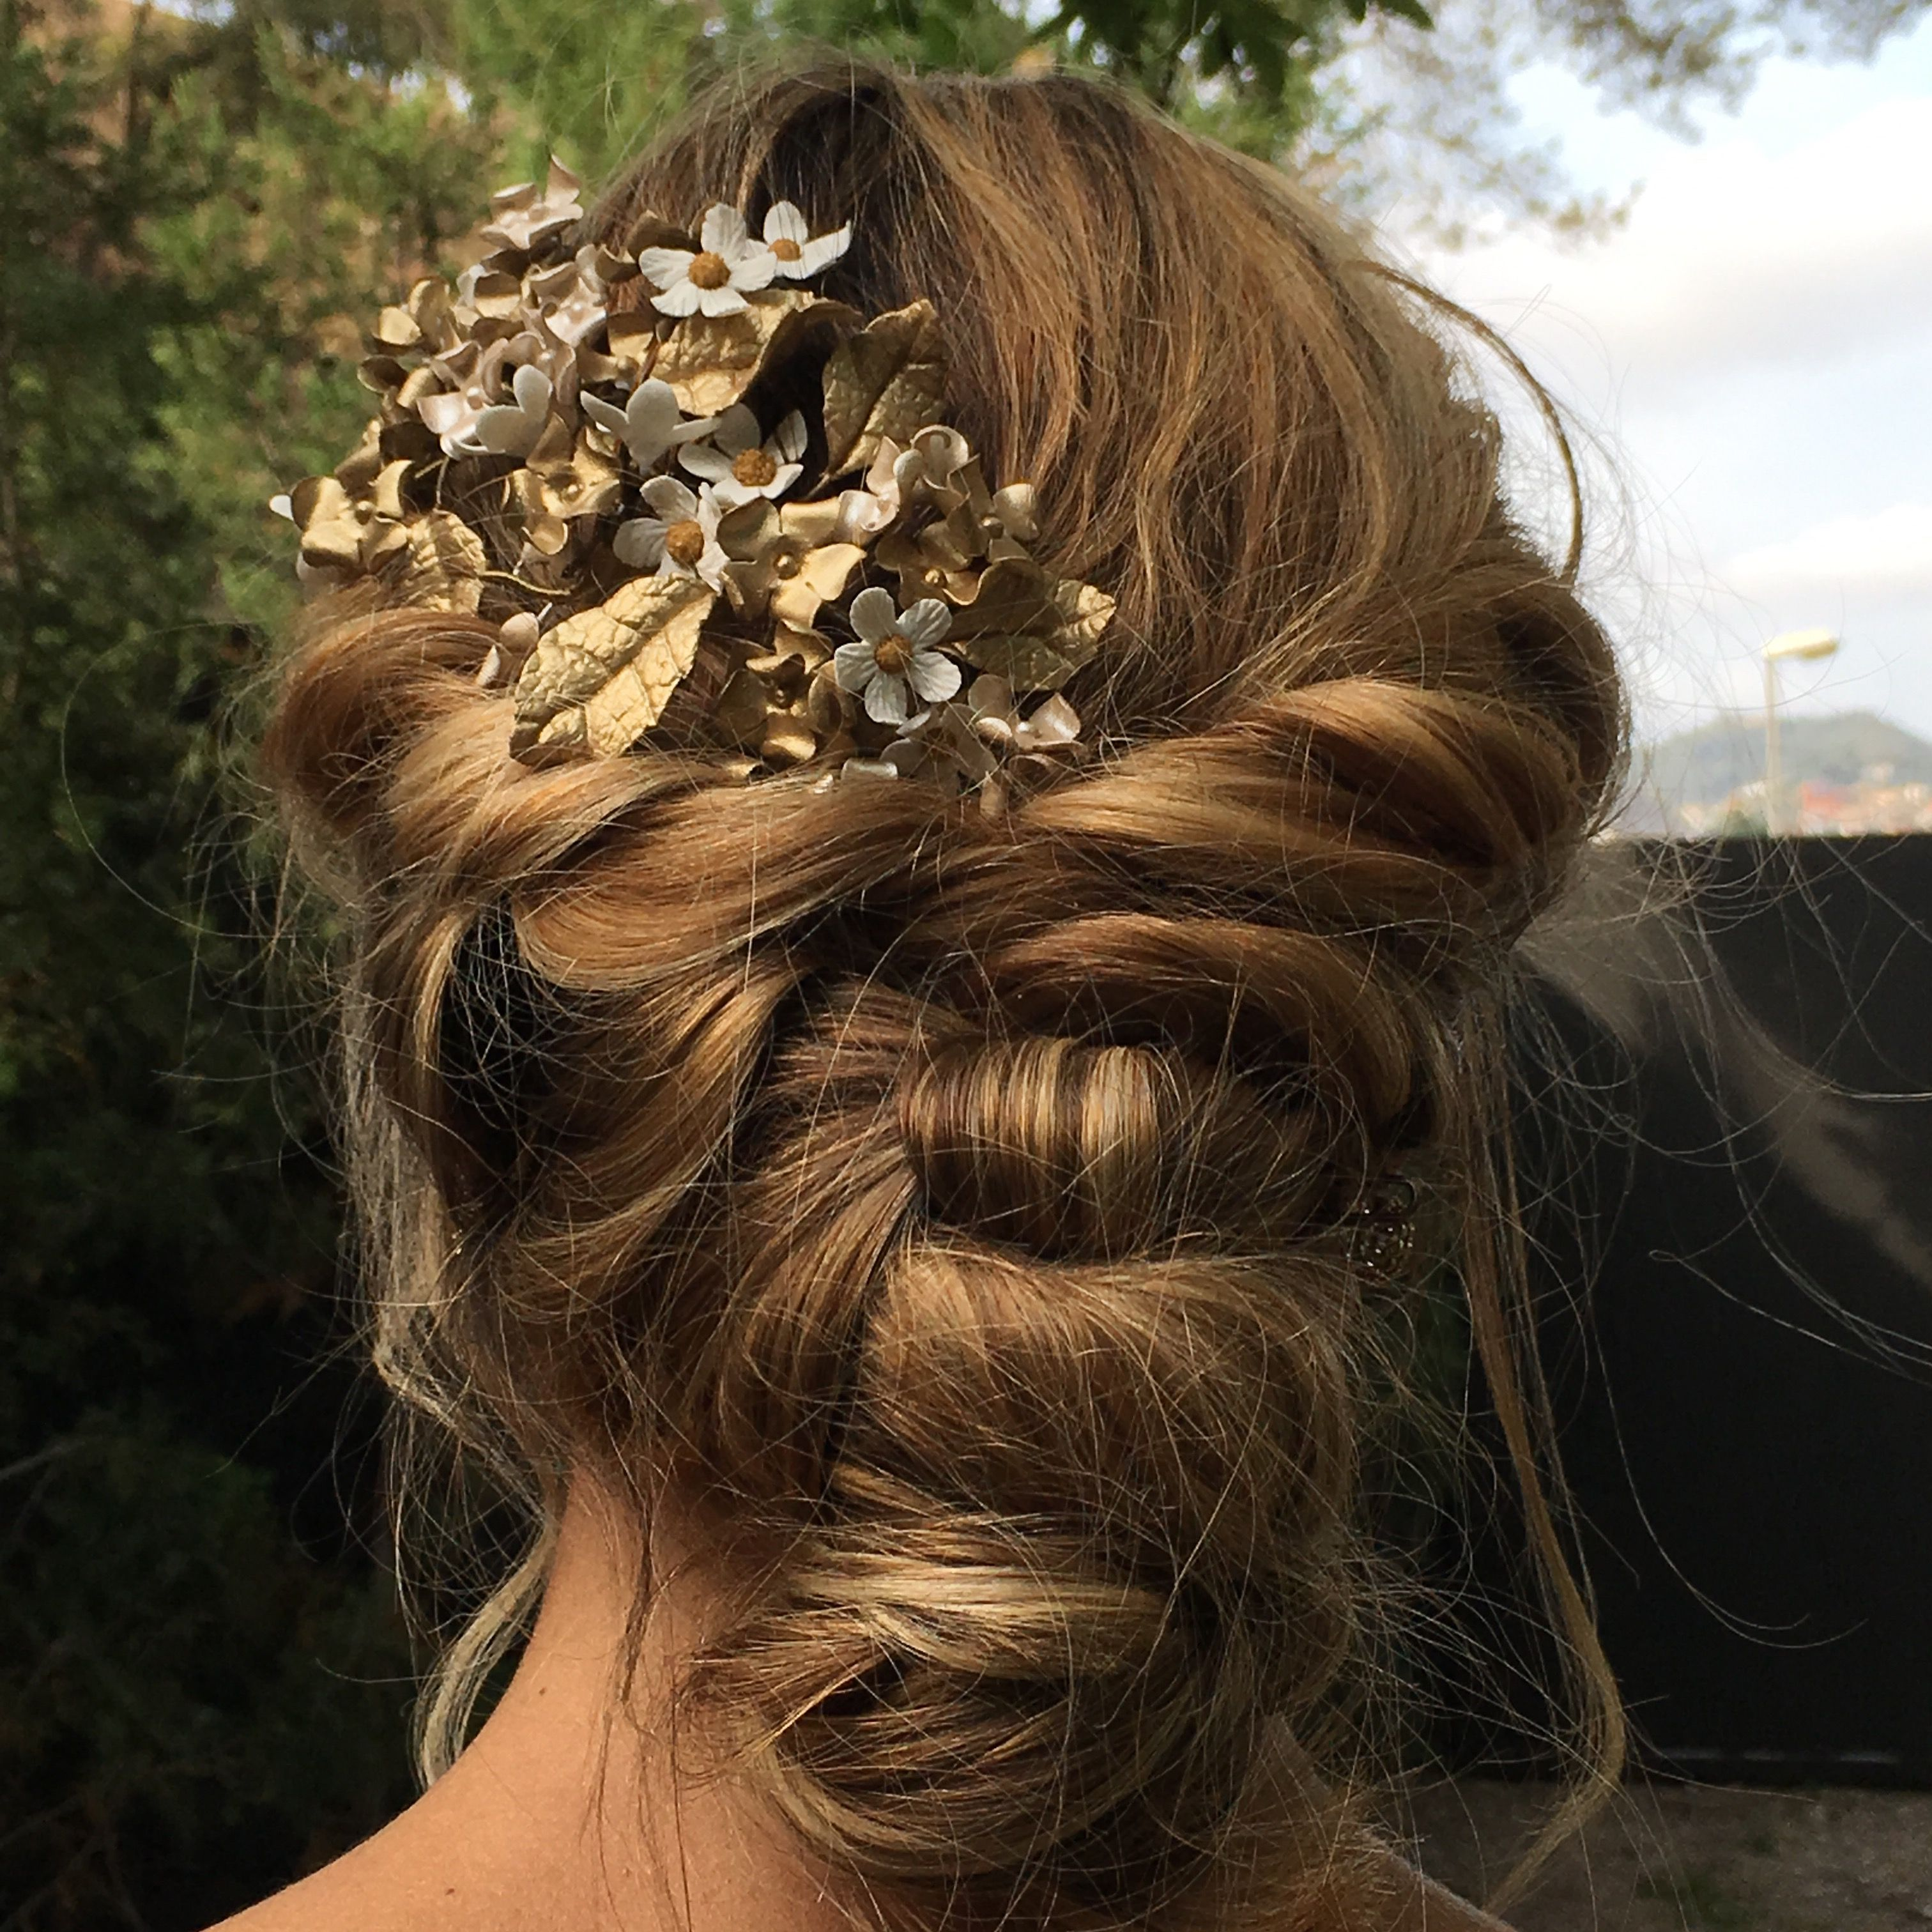 Peinados a la última  #weddingbarcelona  #weddingdress #lovelyweddings #detalles de boda #weddingphotography #weddingflowers #weddingdecorations